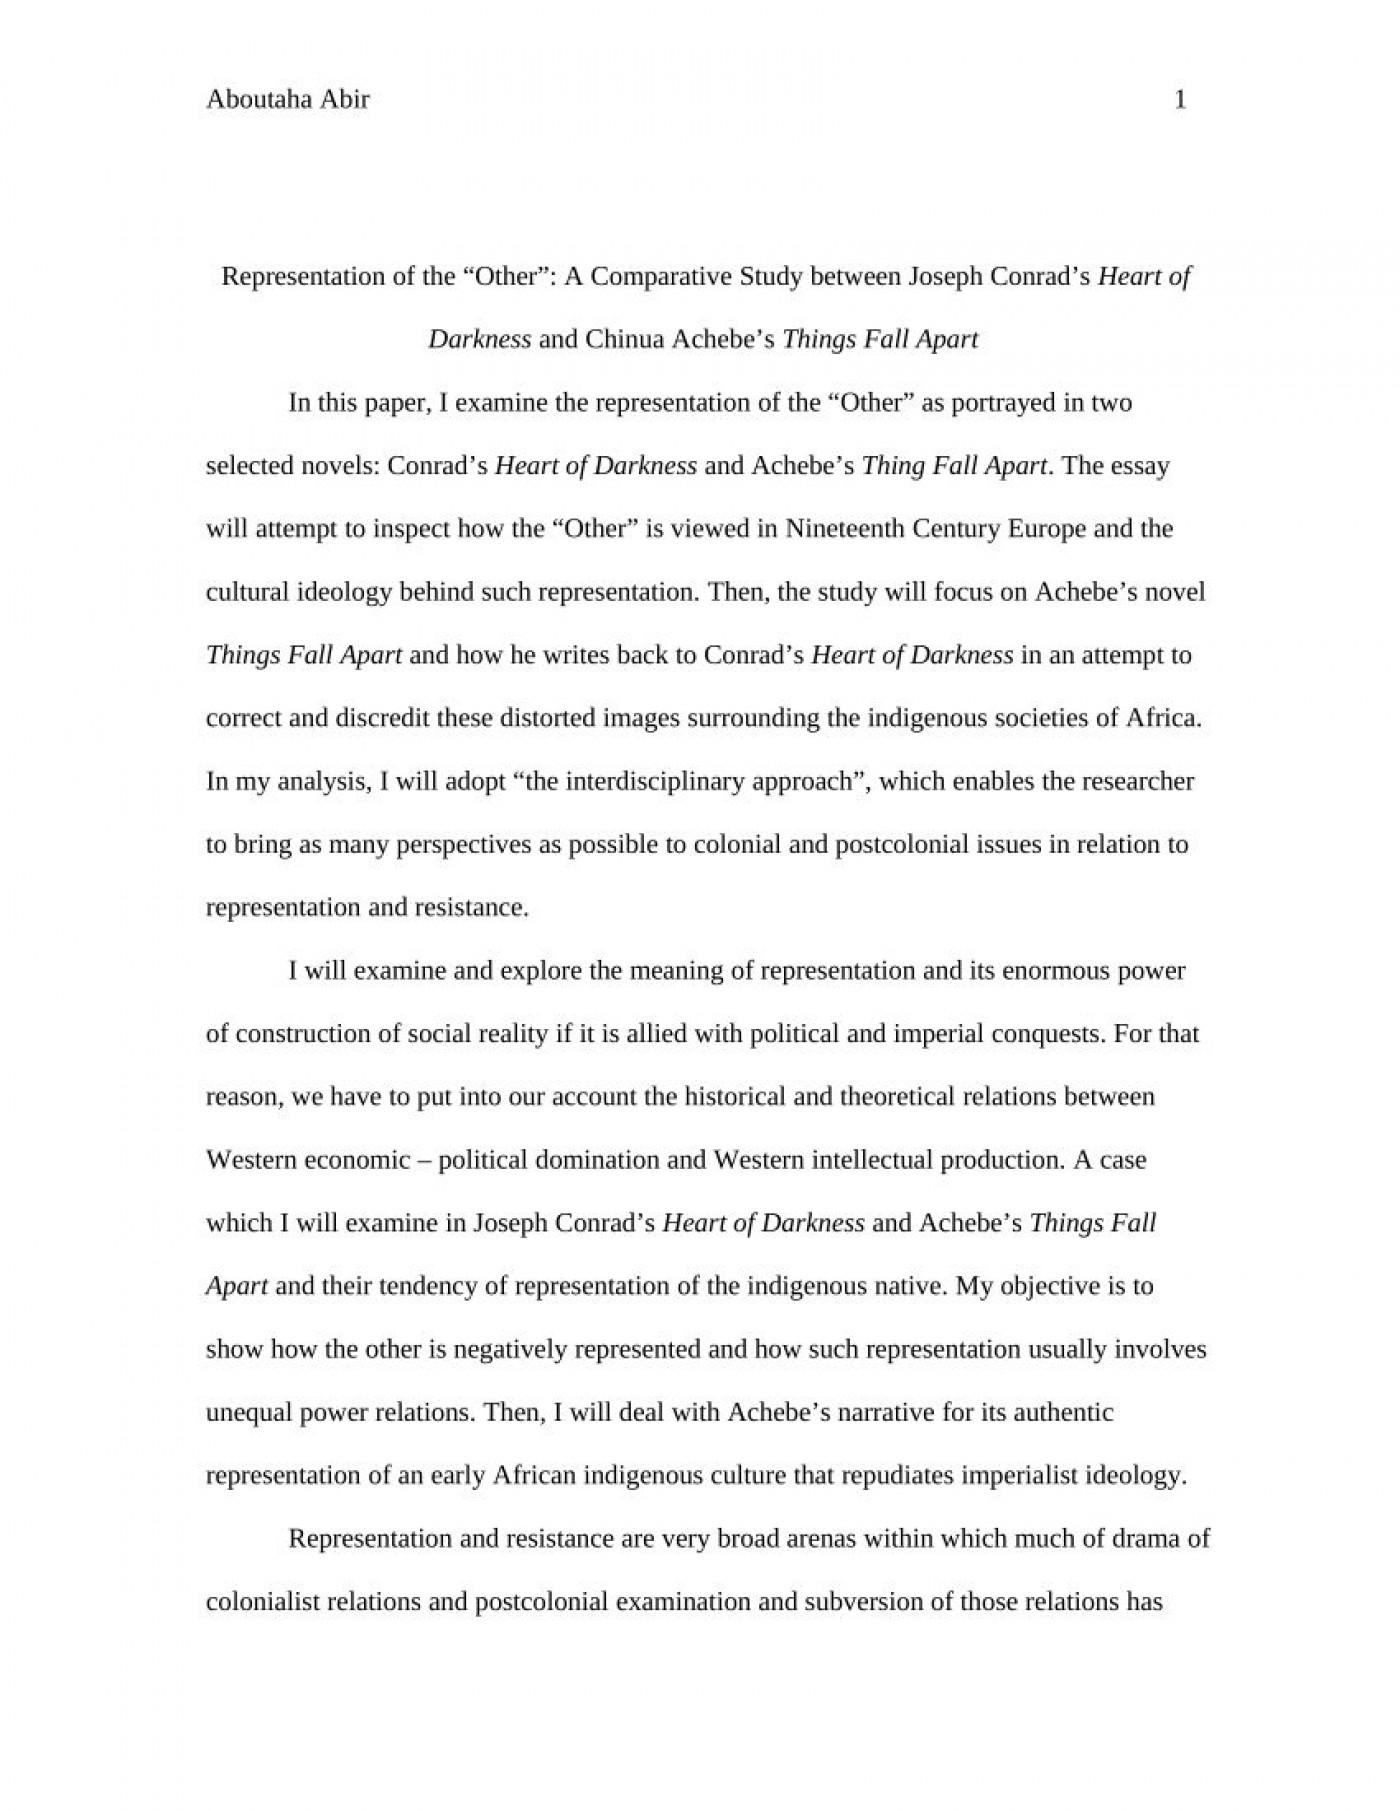 003 Formidable Thing Fall Apart Essay Design 1400